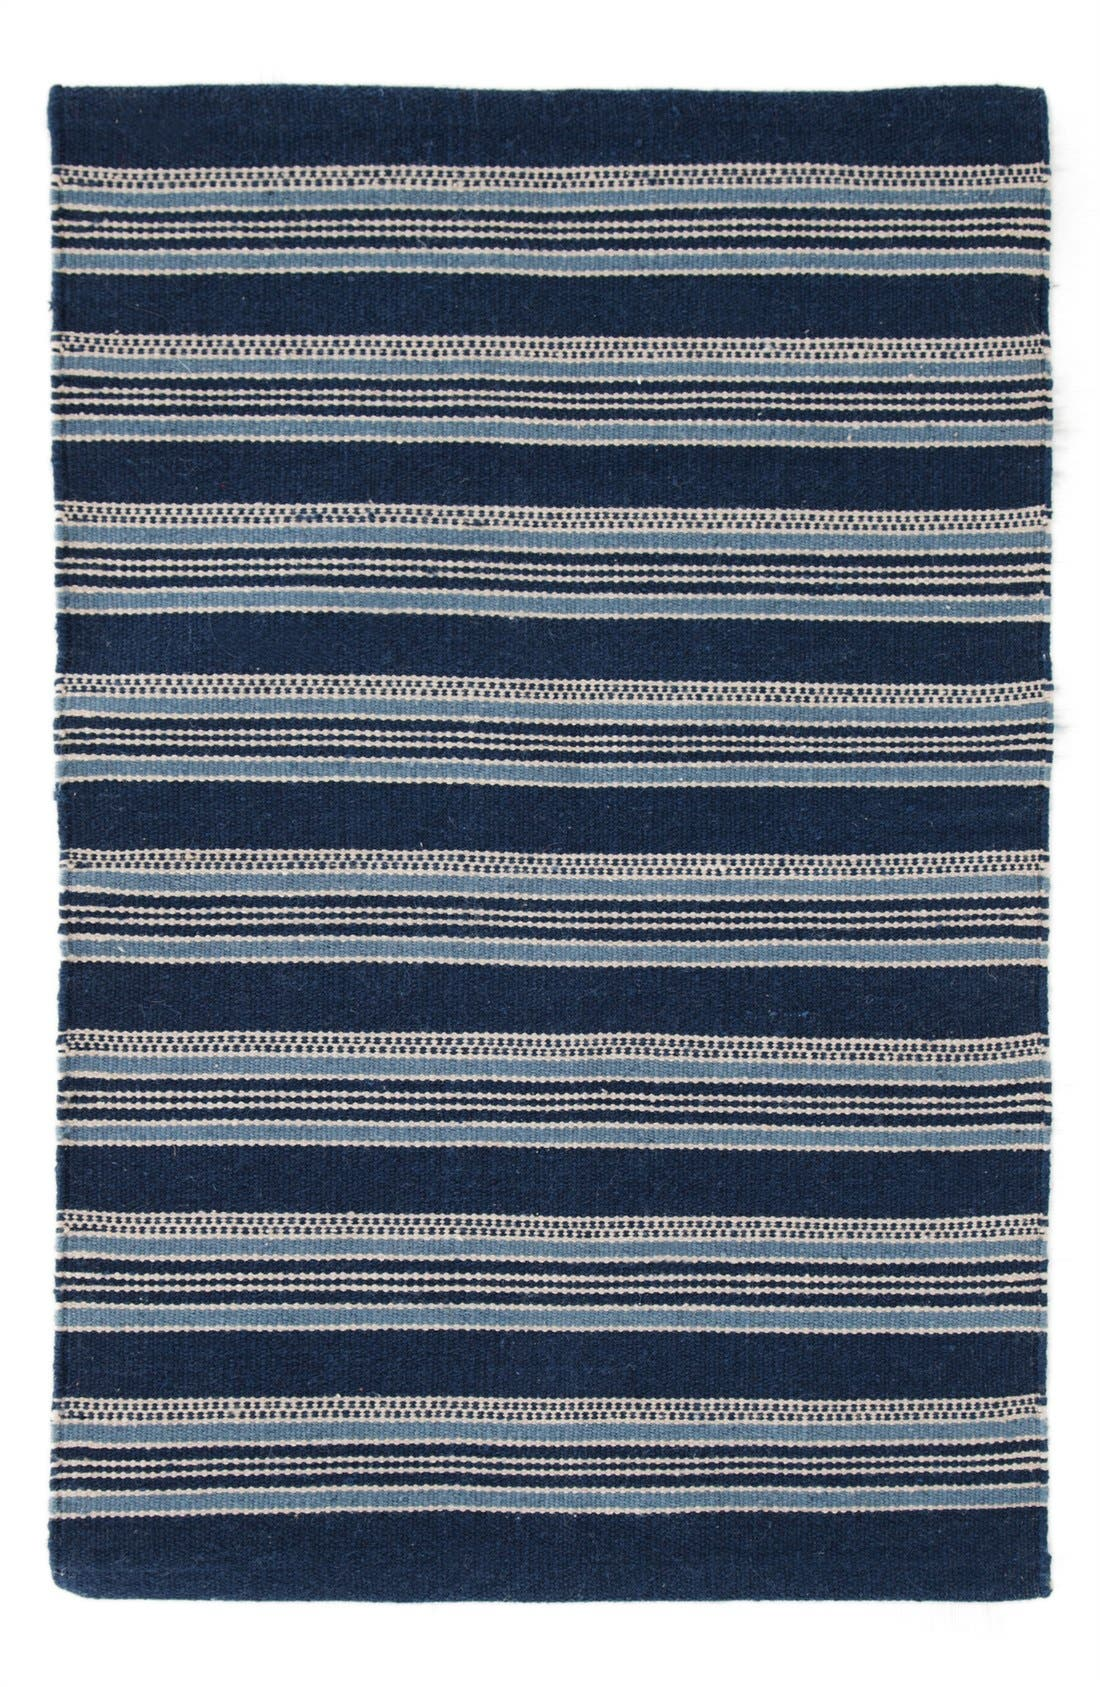 'Cameroon' Indoor/Outdoor Rug,                         Main,                         color, BLUE/ MULTI